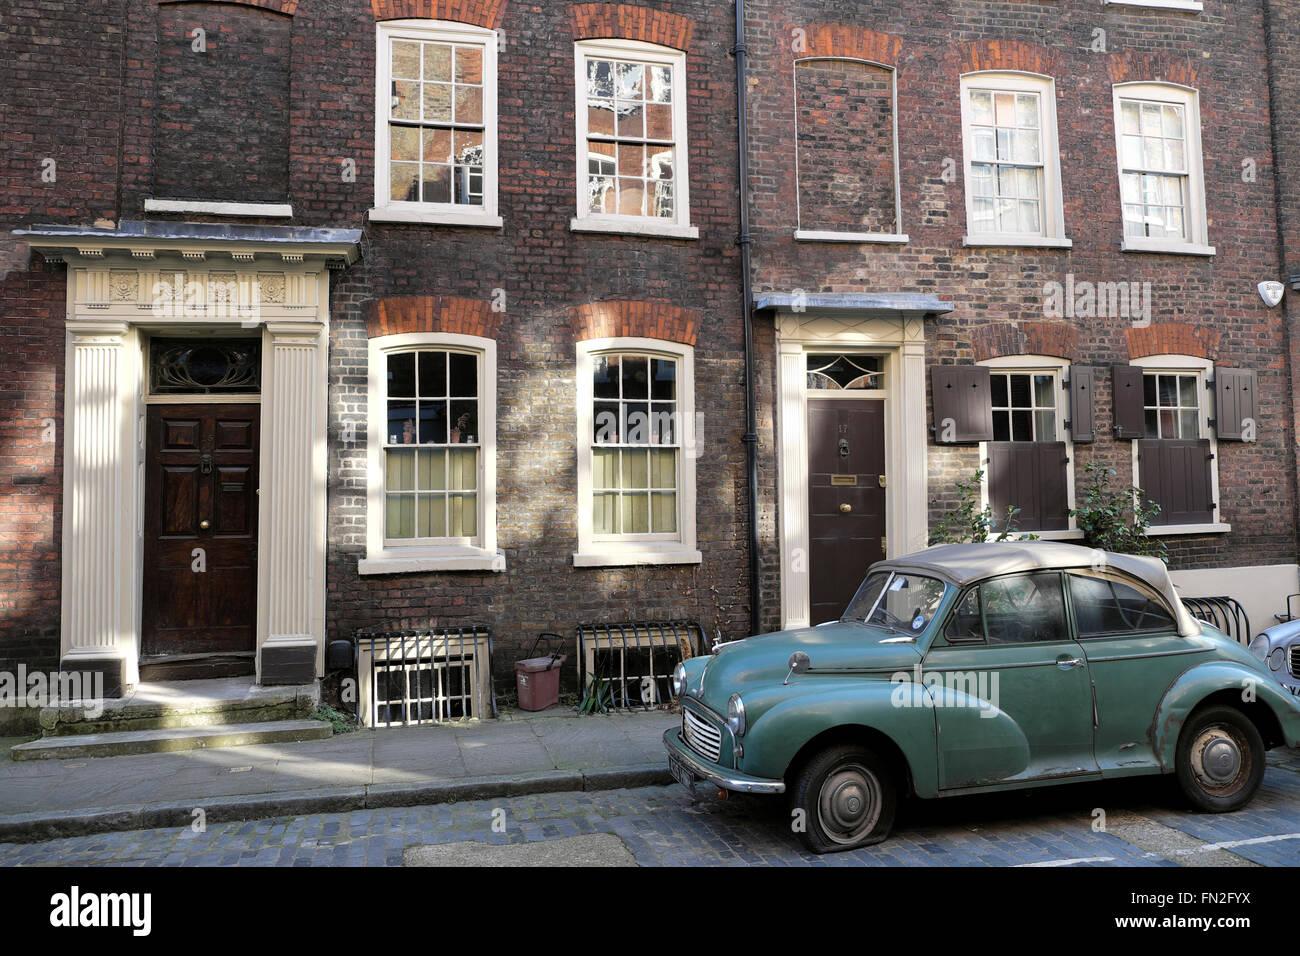 Morris Minor car with a flat tire parked on Elder Street in Spitalfields, London E1  KATHY DEWITT Stock Photo